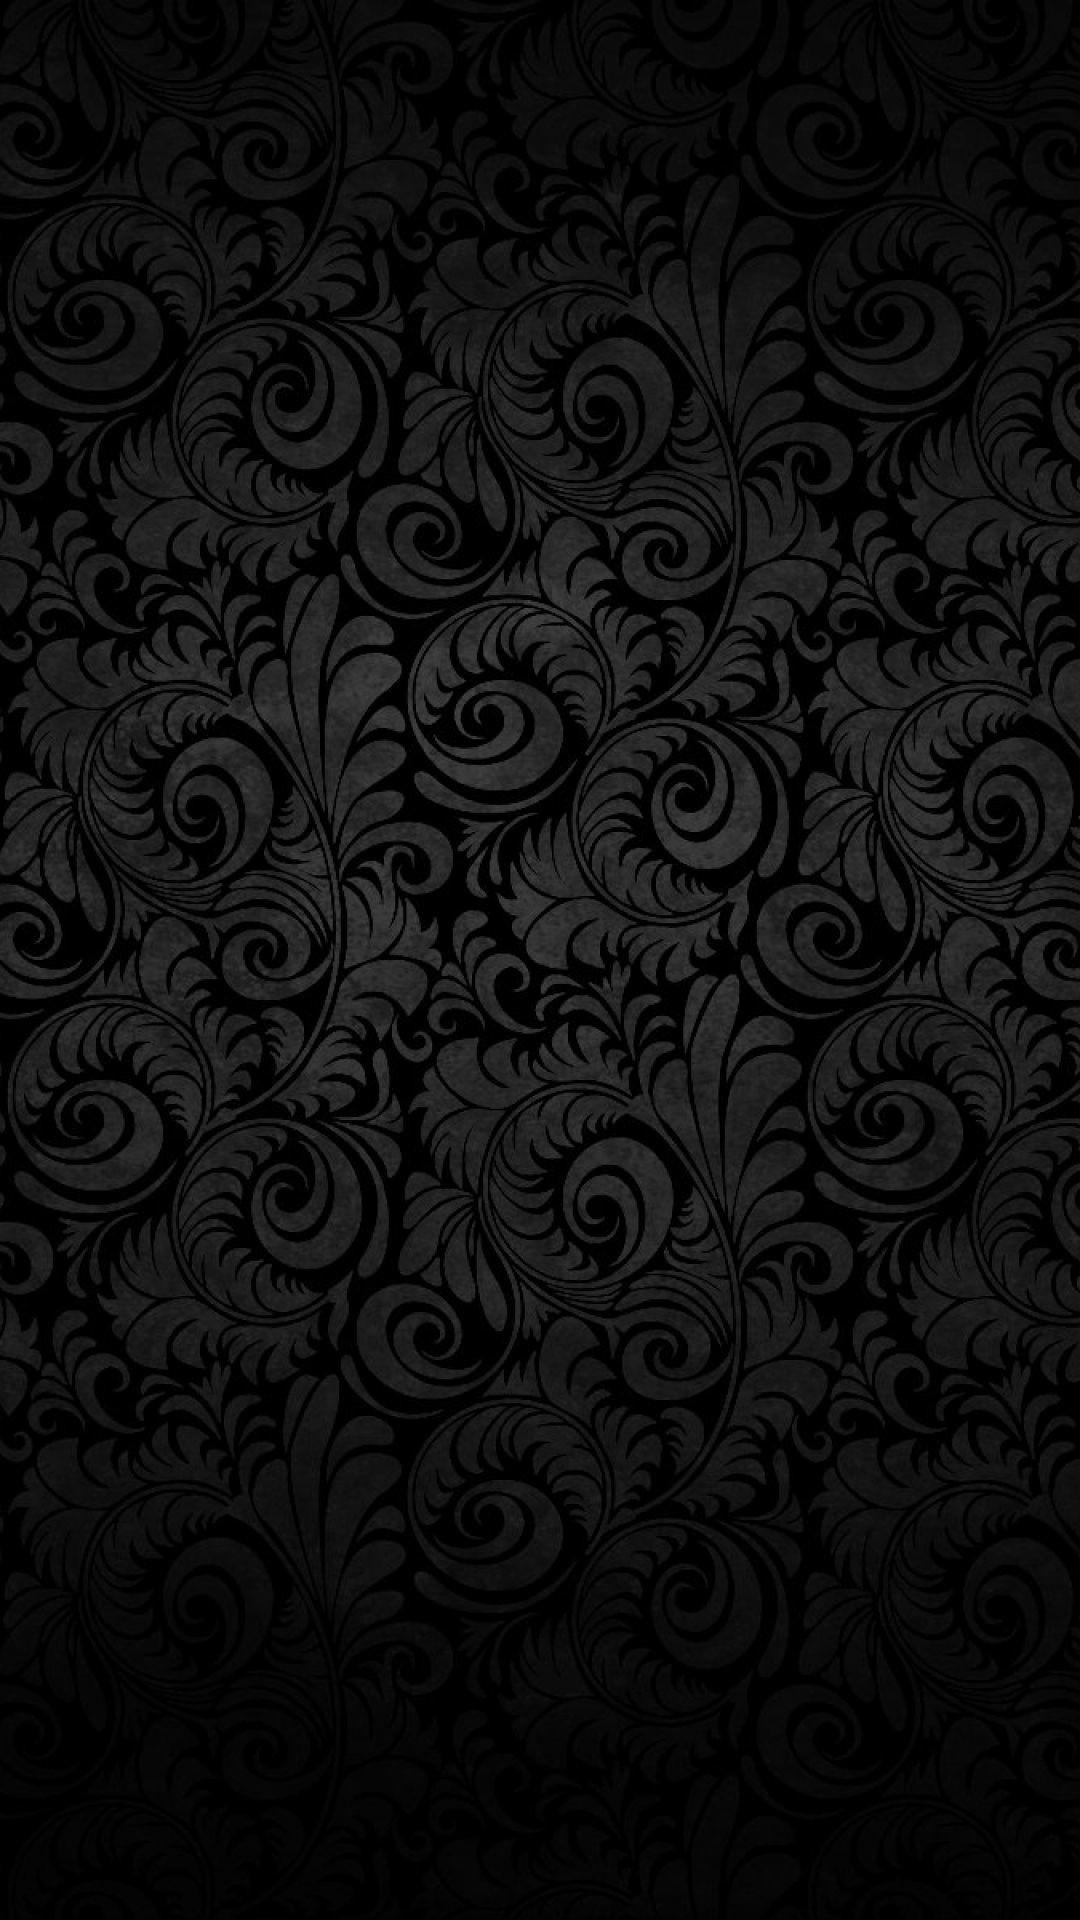 Black Paisley Wallpaper 38 Images